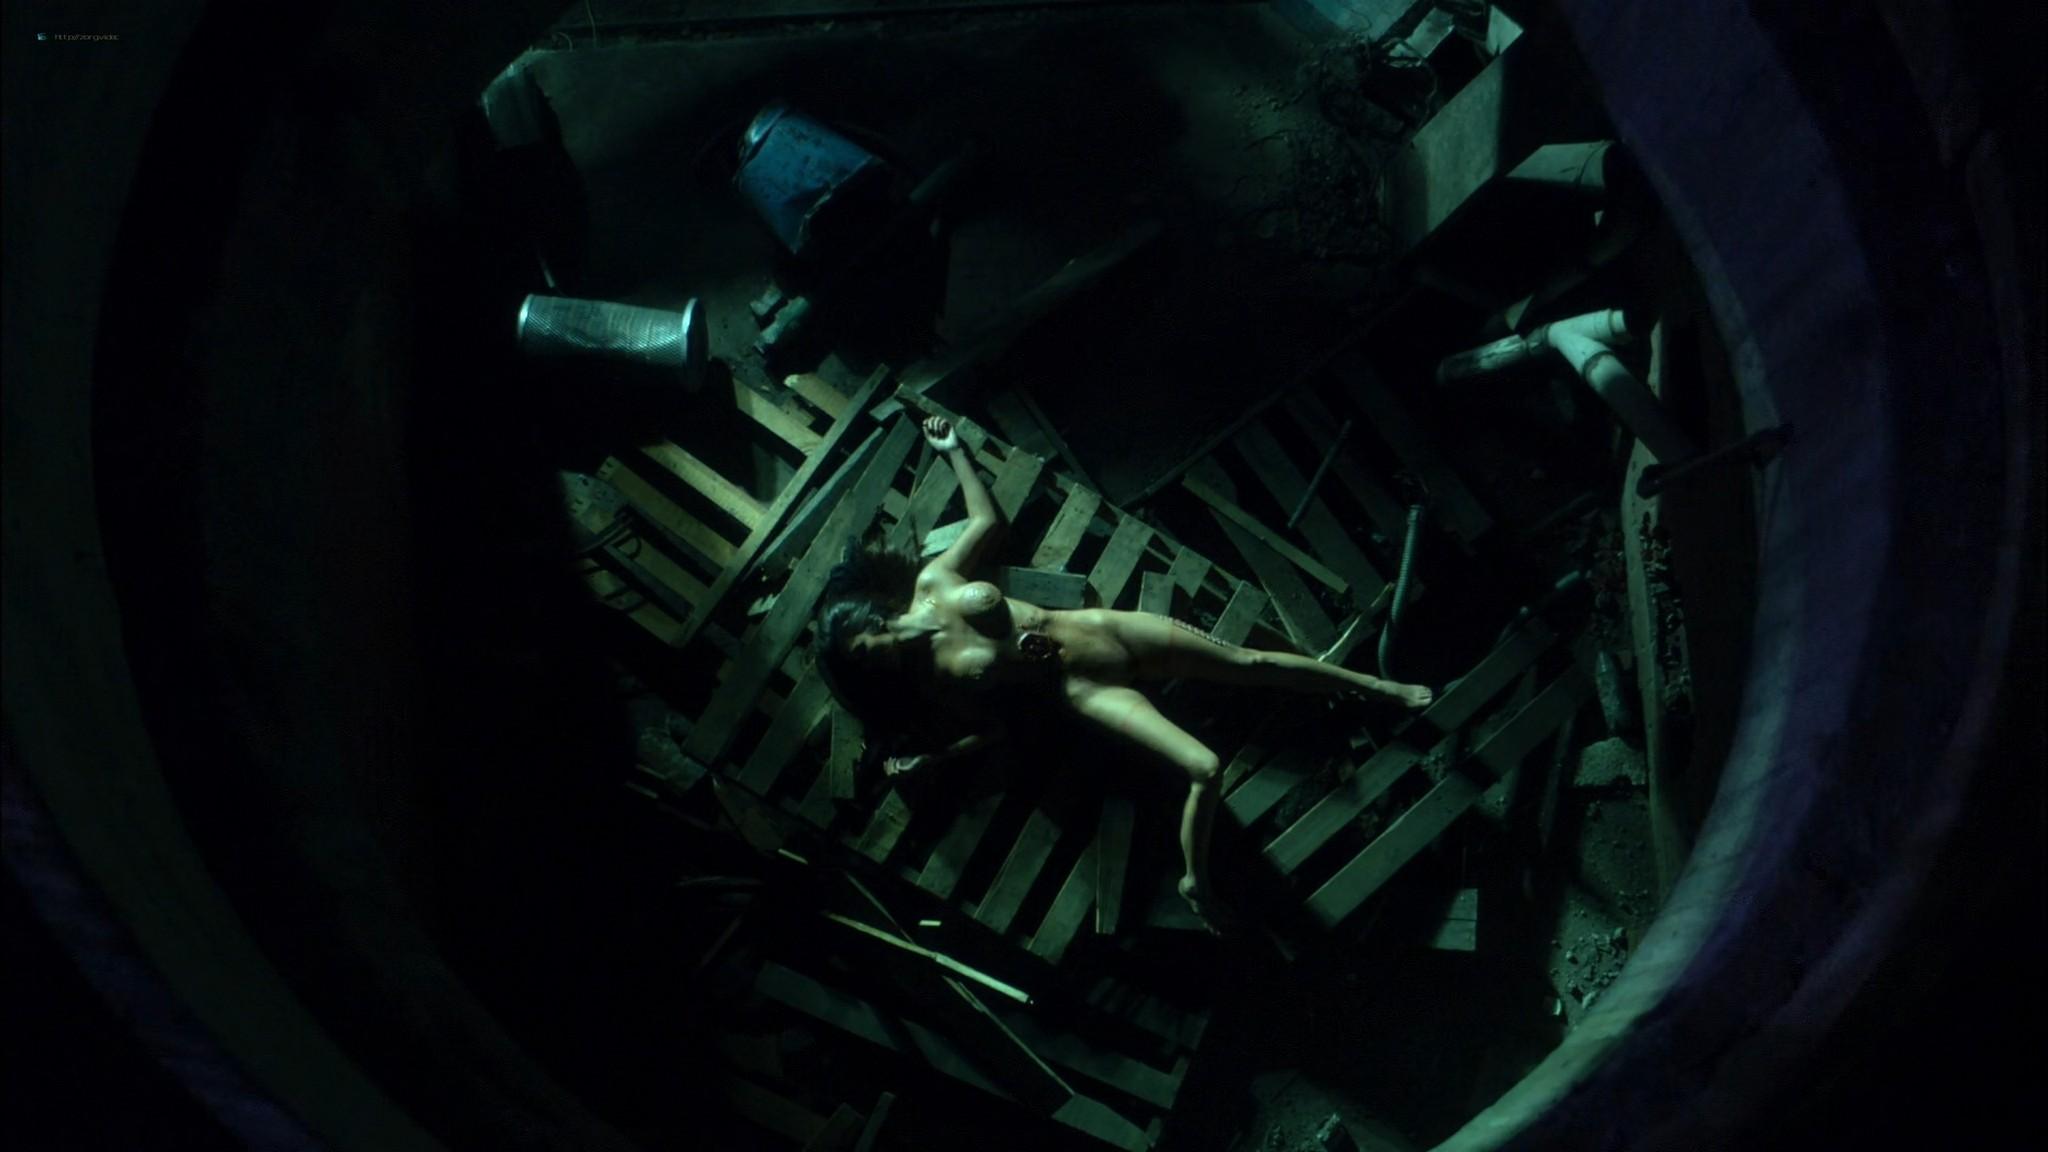 Helena Mattsson nude full frontal and Marlene Favela nude Species The Awakening 2007 HD 1080p BluRay REMUX 022